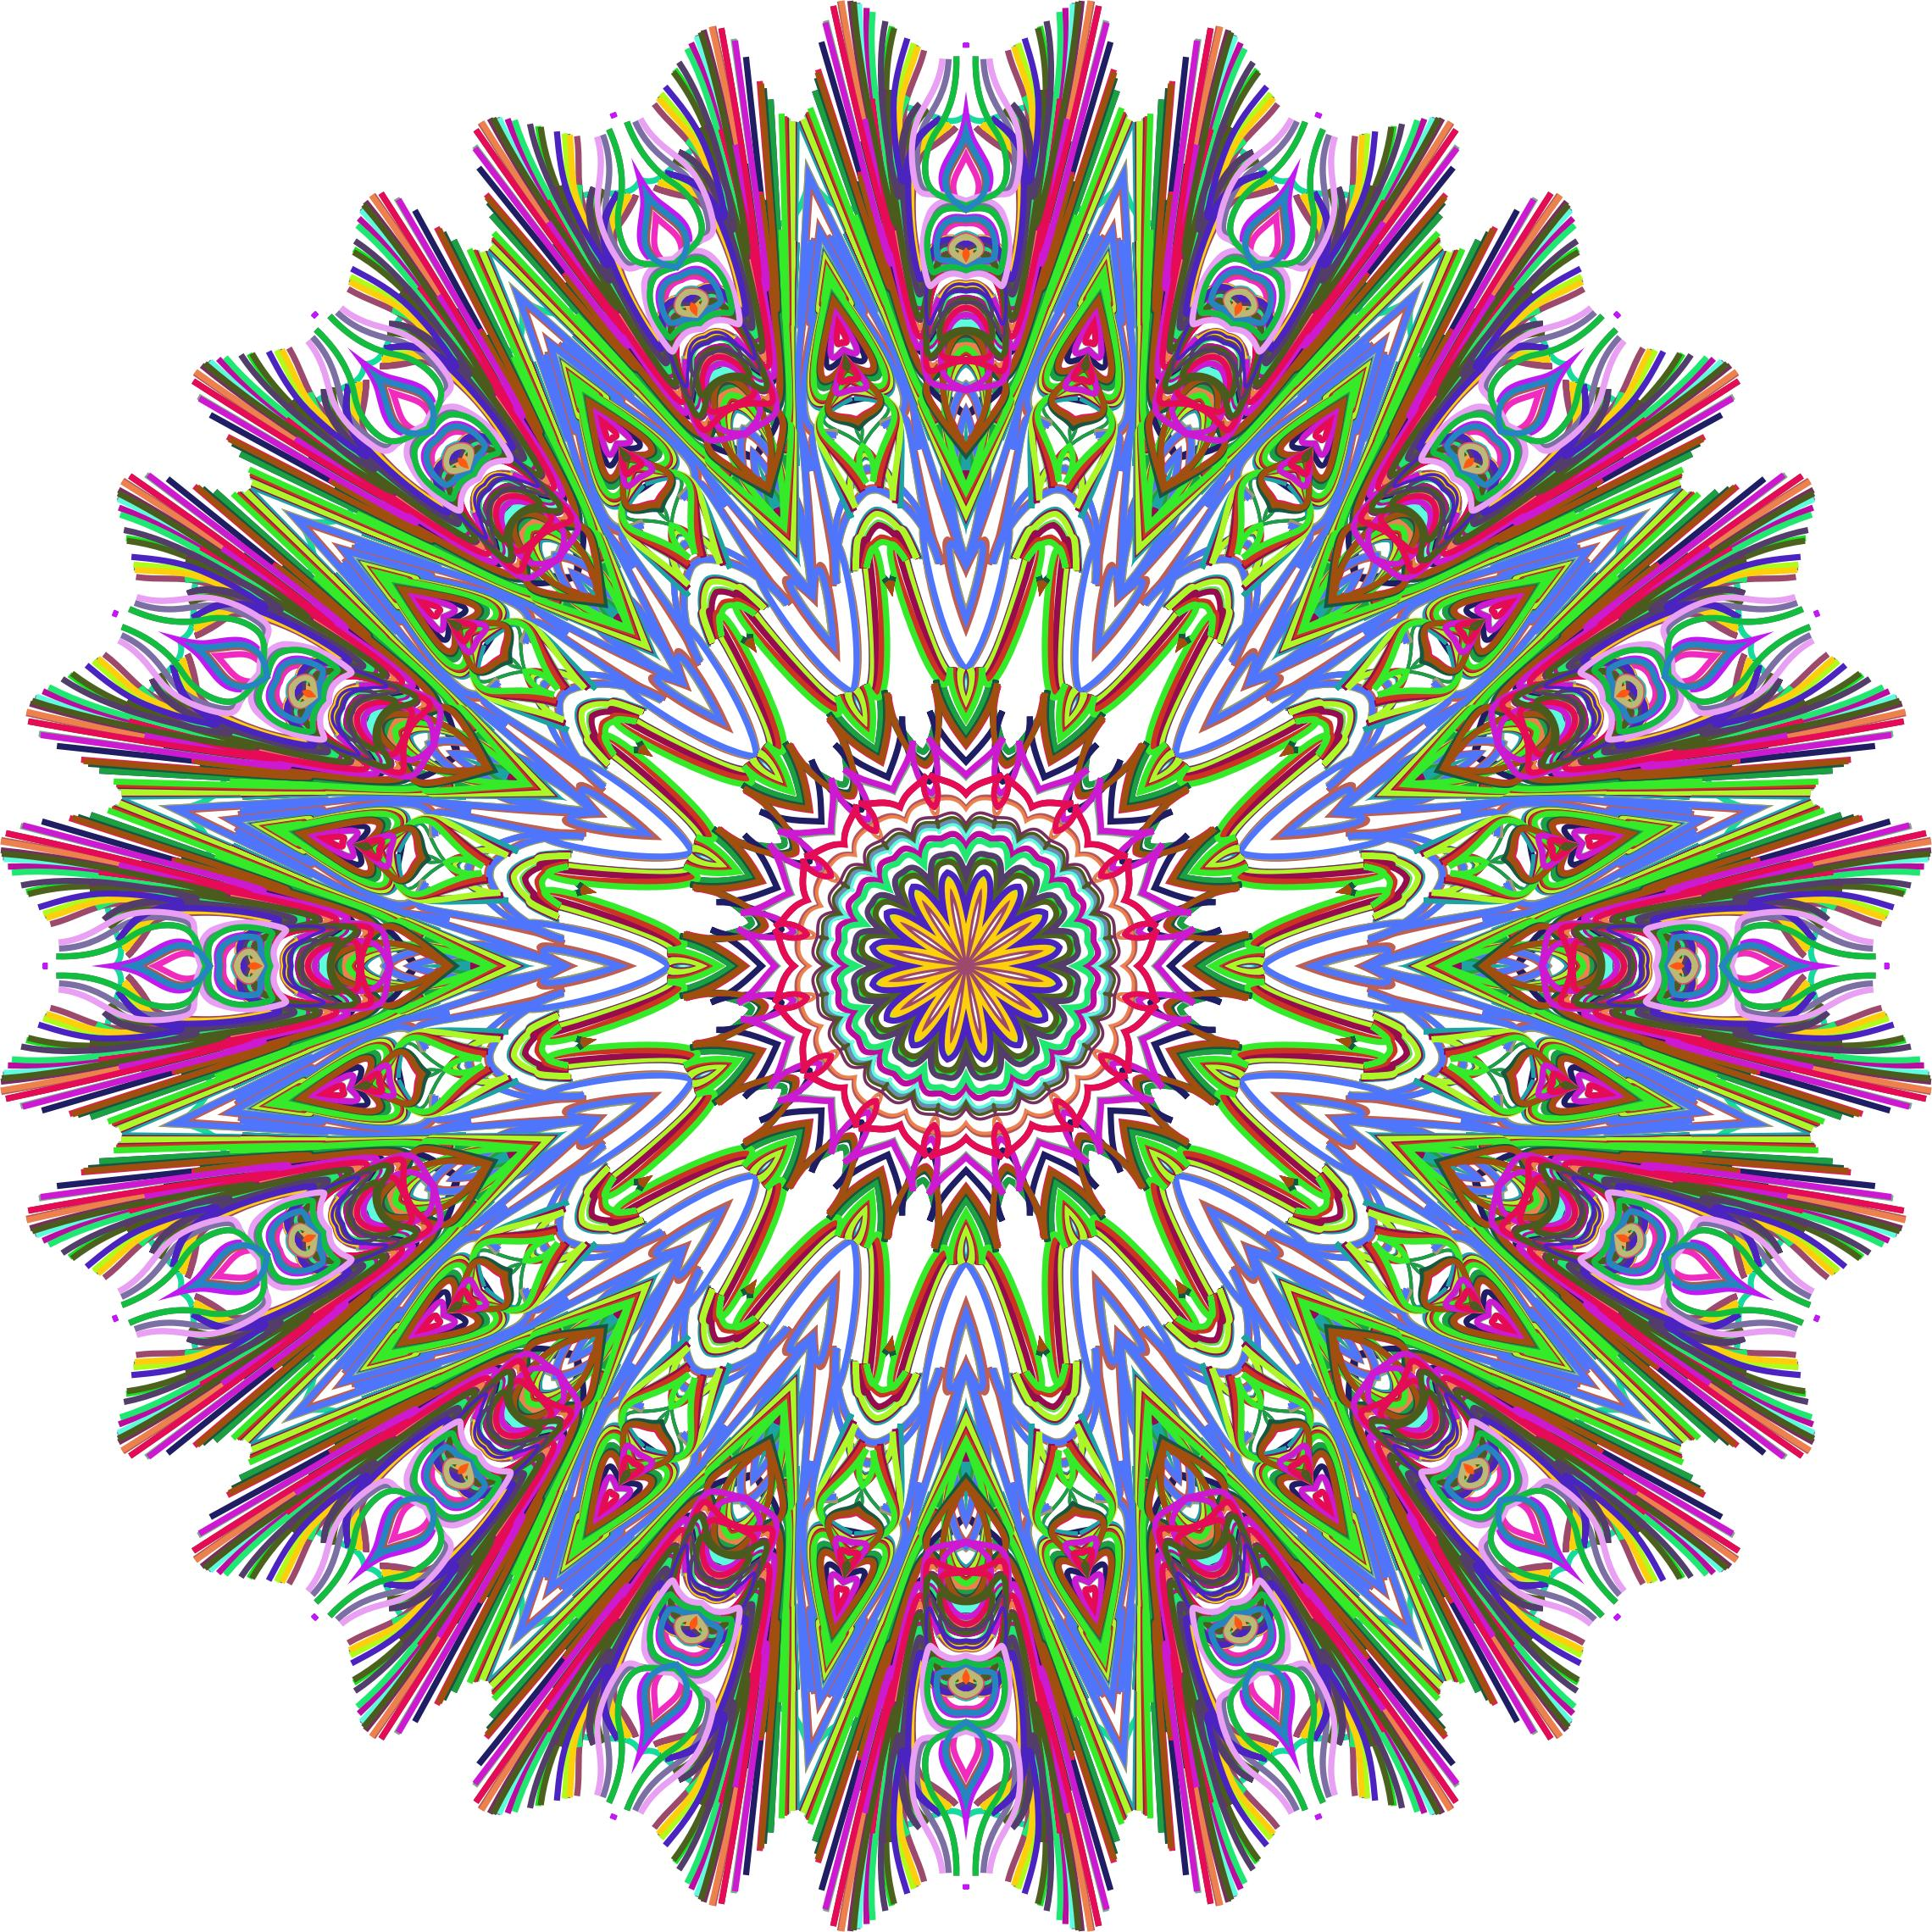 2280x2280 Free Mandala Icons Png, Mandala Images